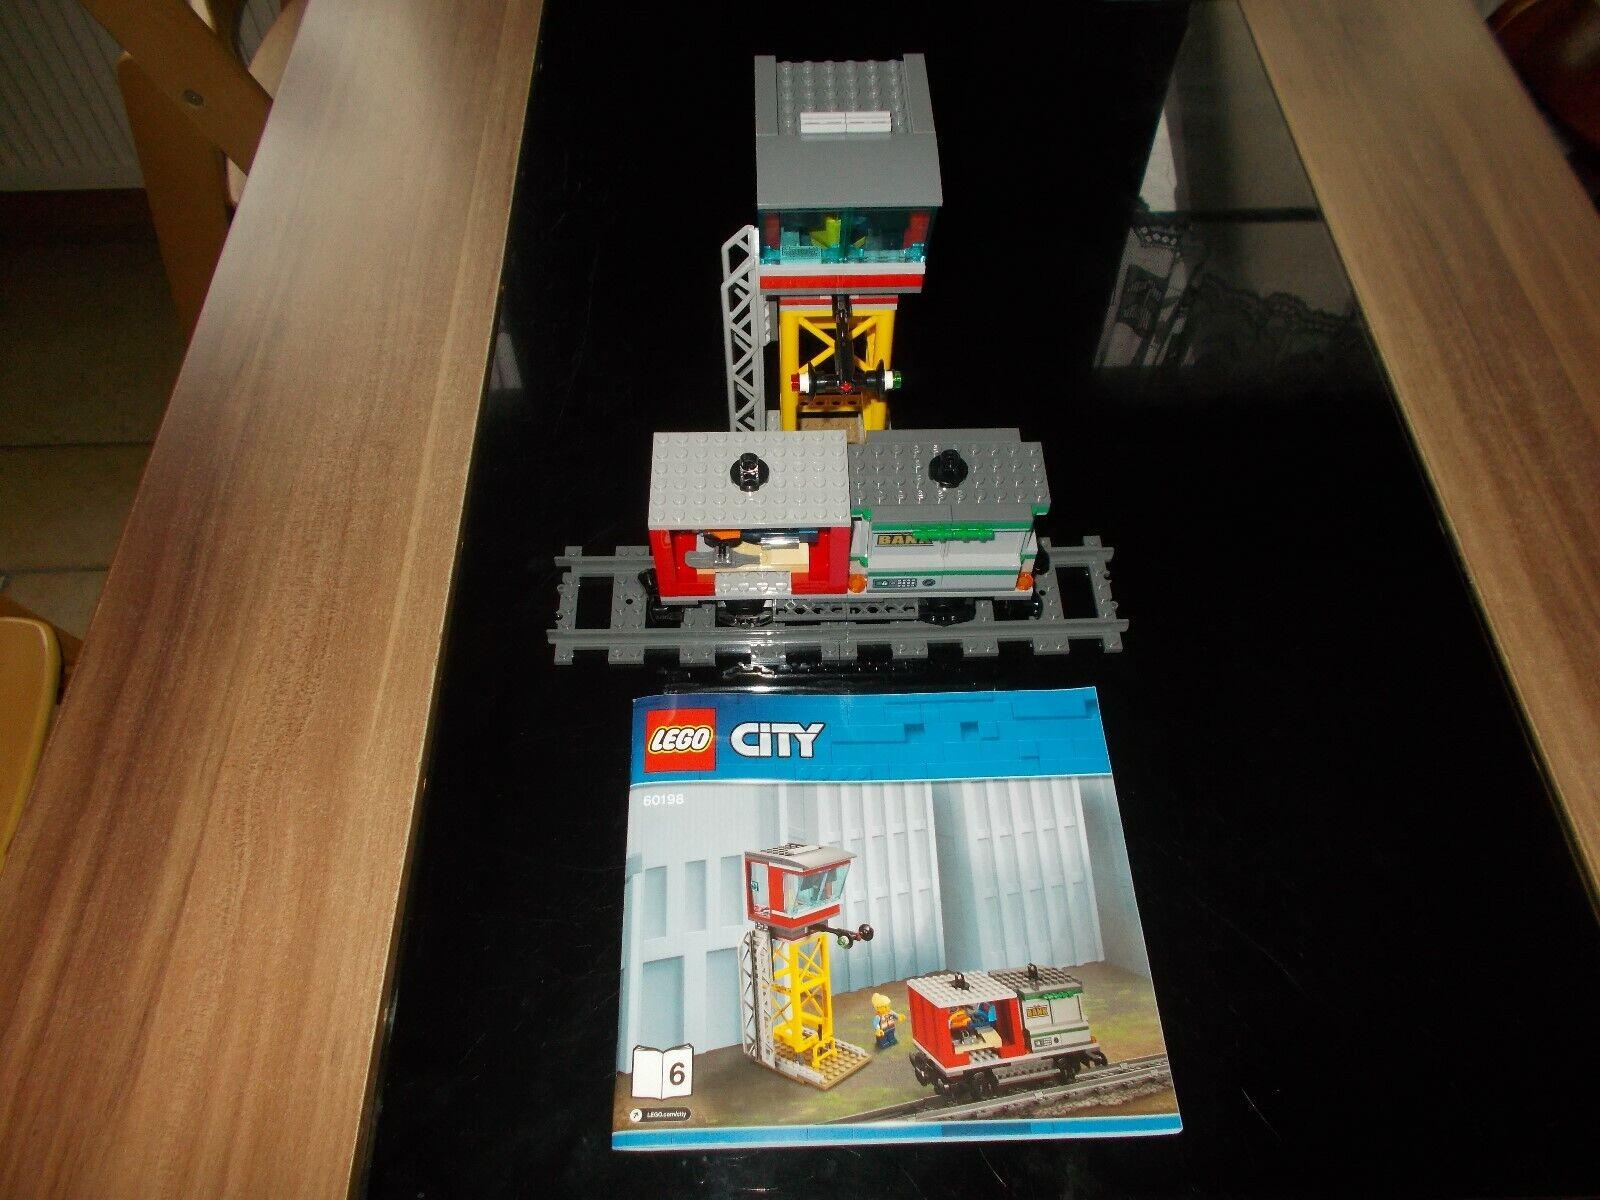 Lego® City Eisenbahn - aus 60198 - Set 1 2 6 - Stapler Auto Waggon - wie neu